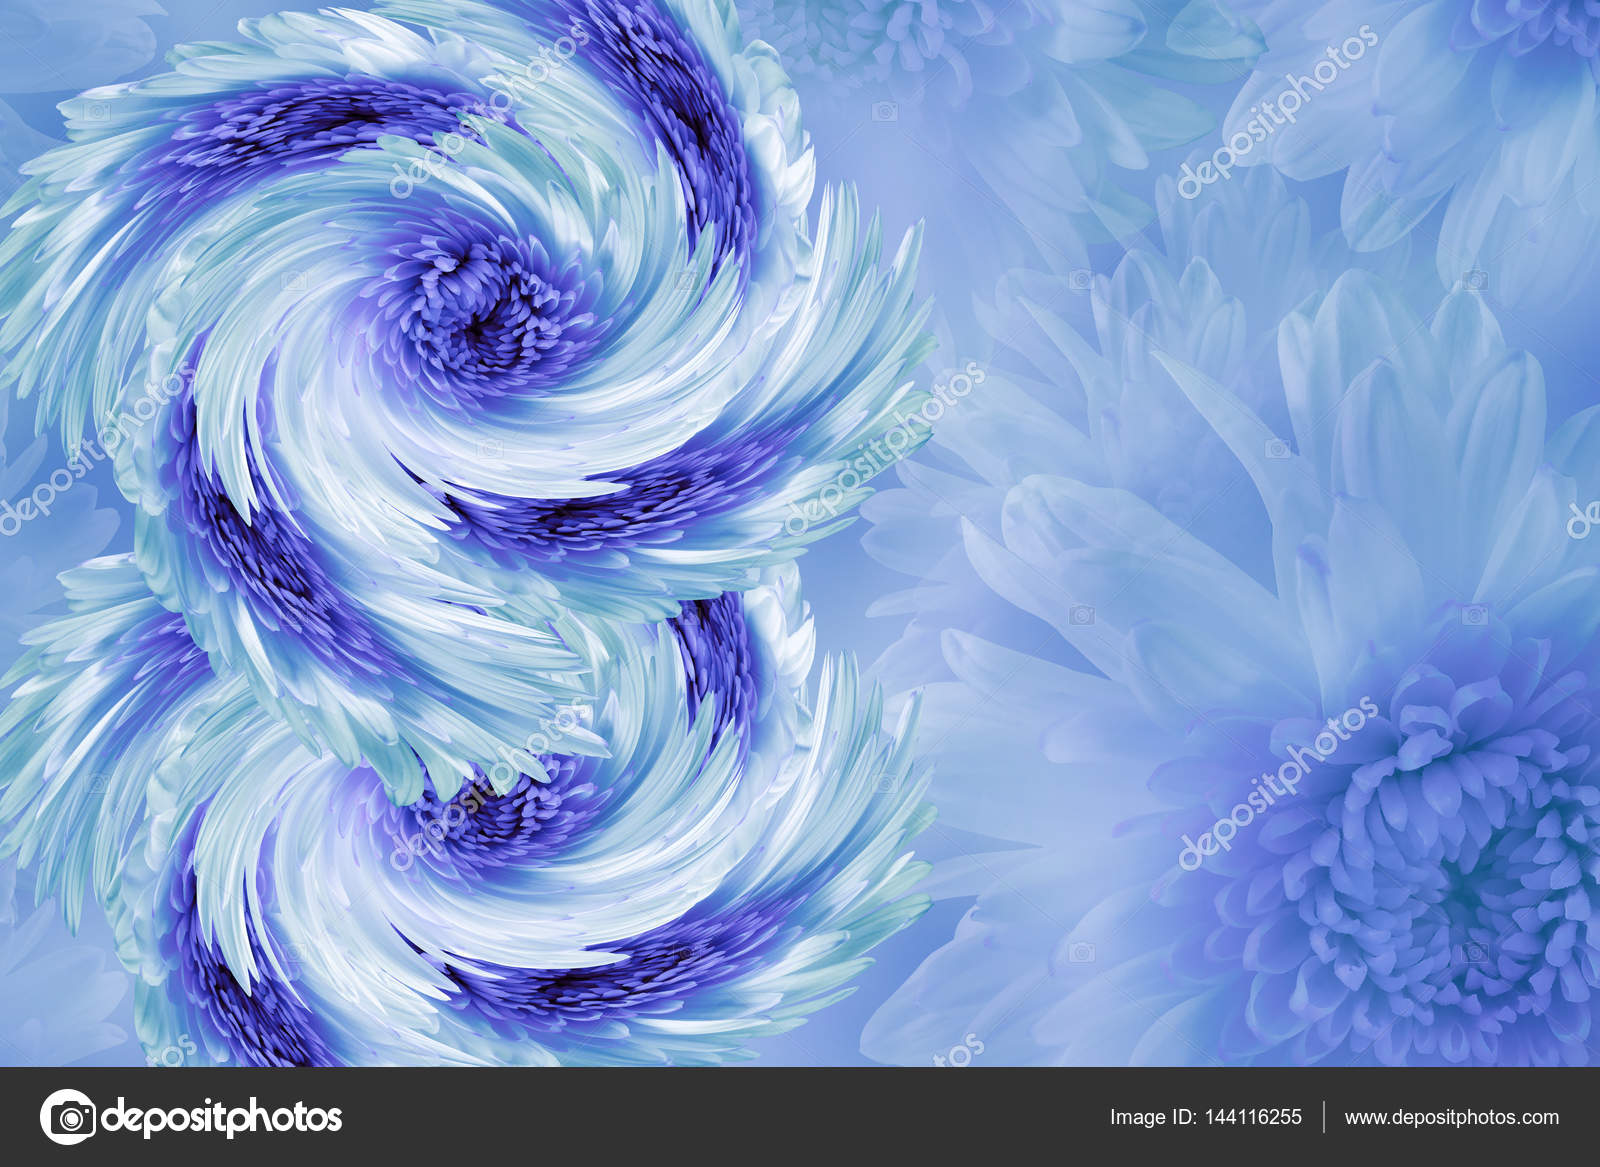 Flowers on blurry white blue turquoise background blue white violet flowers on blurry white blue turquoise background blue white violet flowers izmirmasajfo